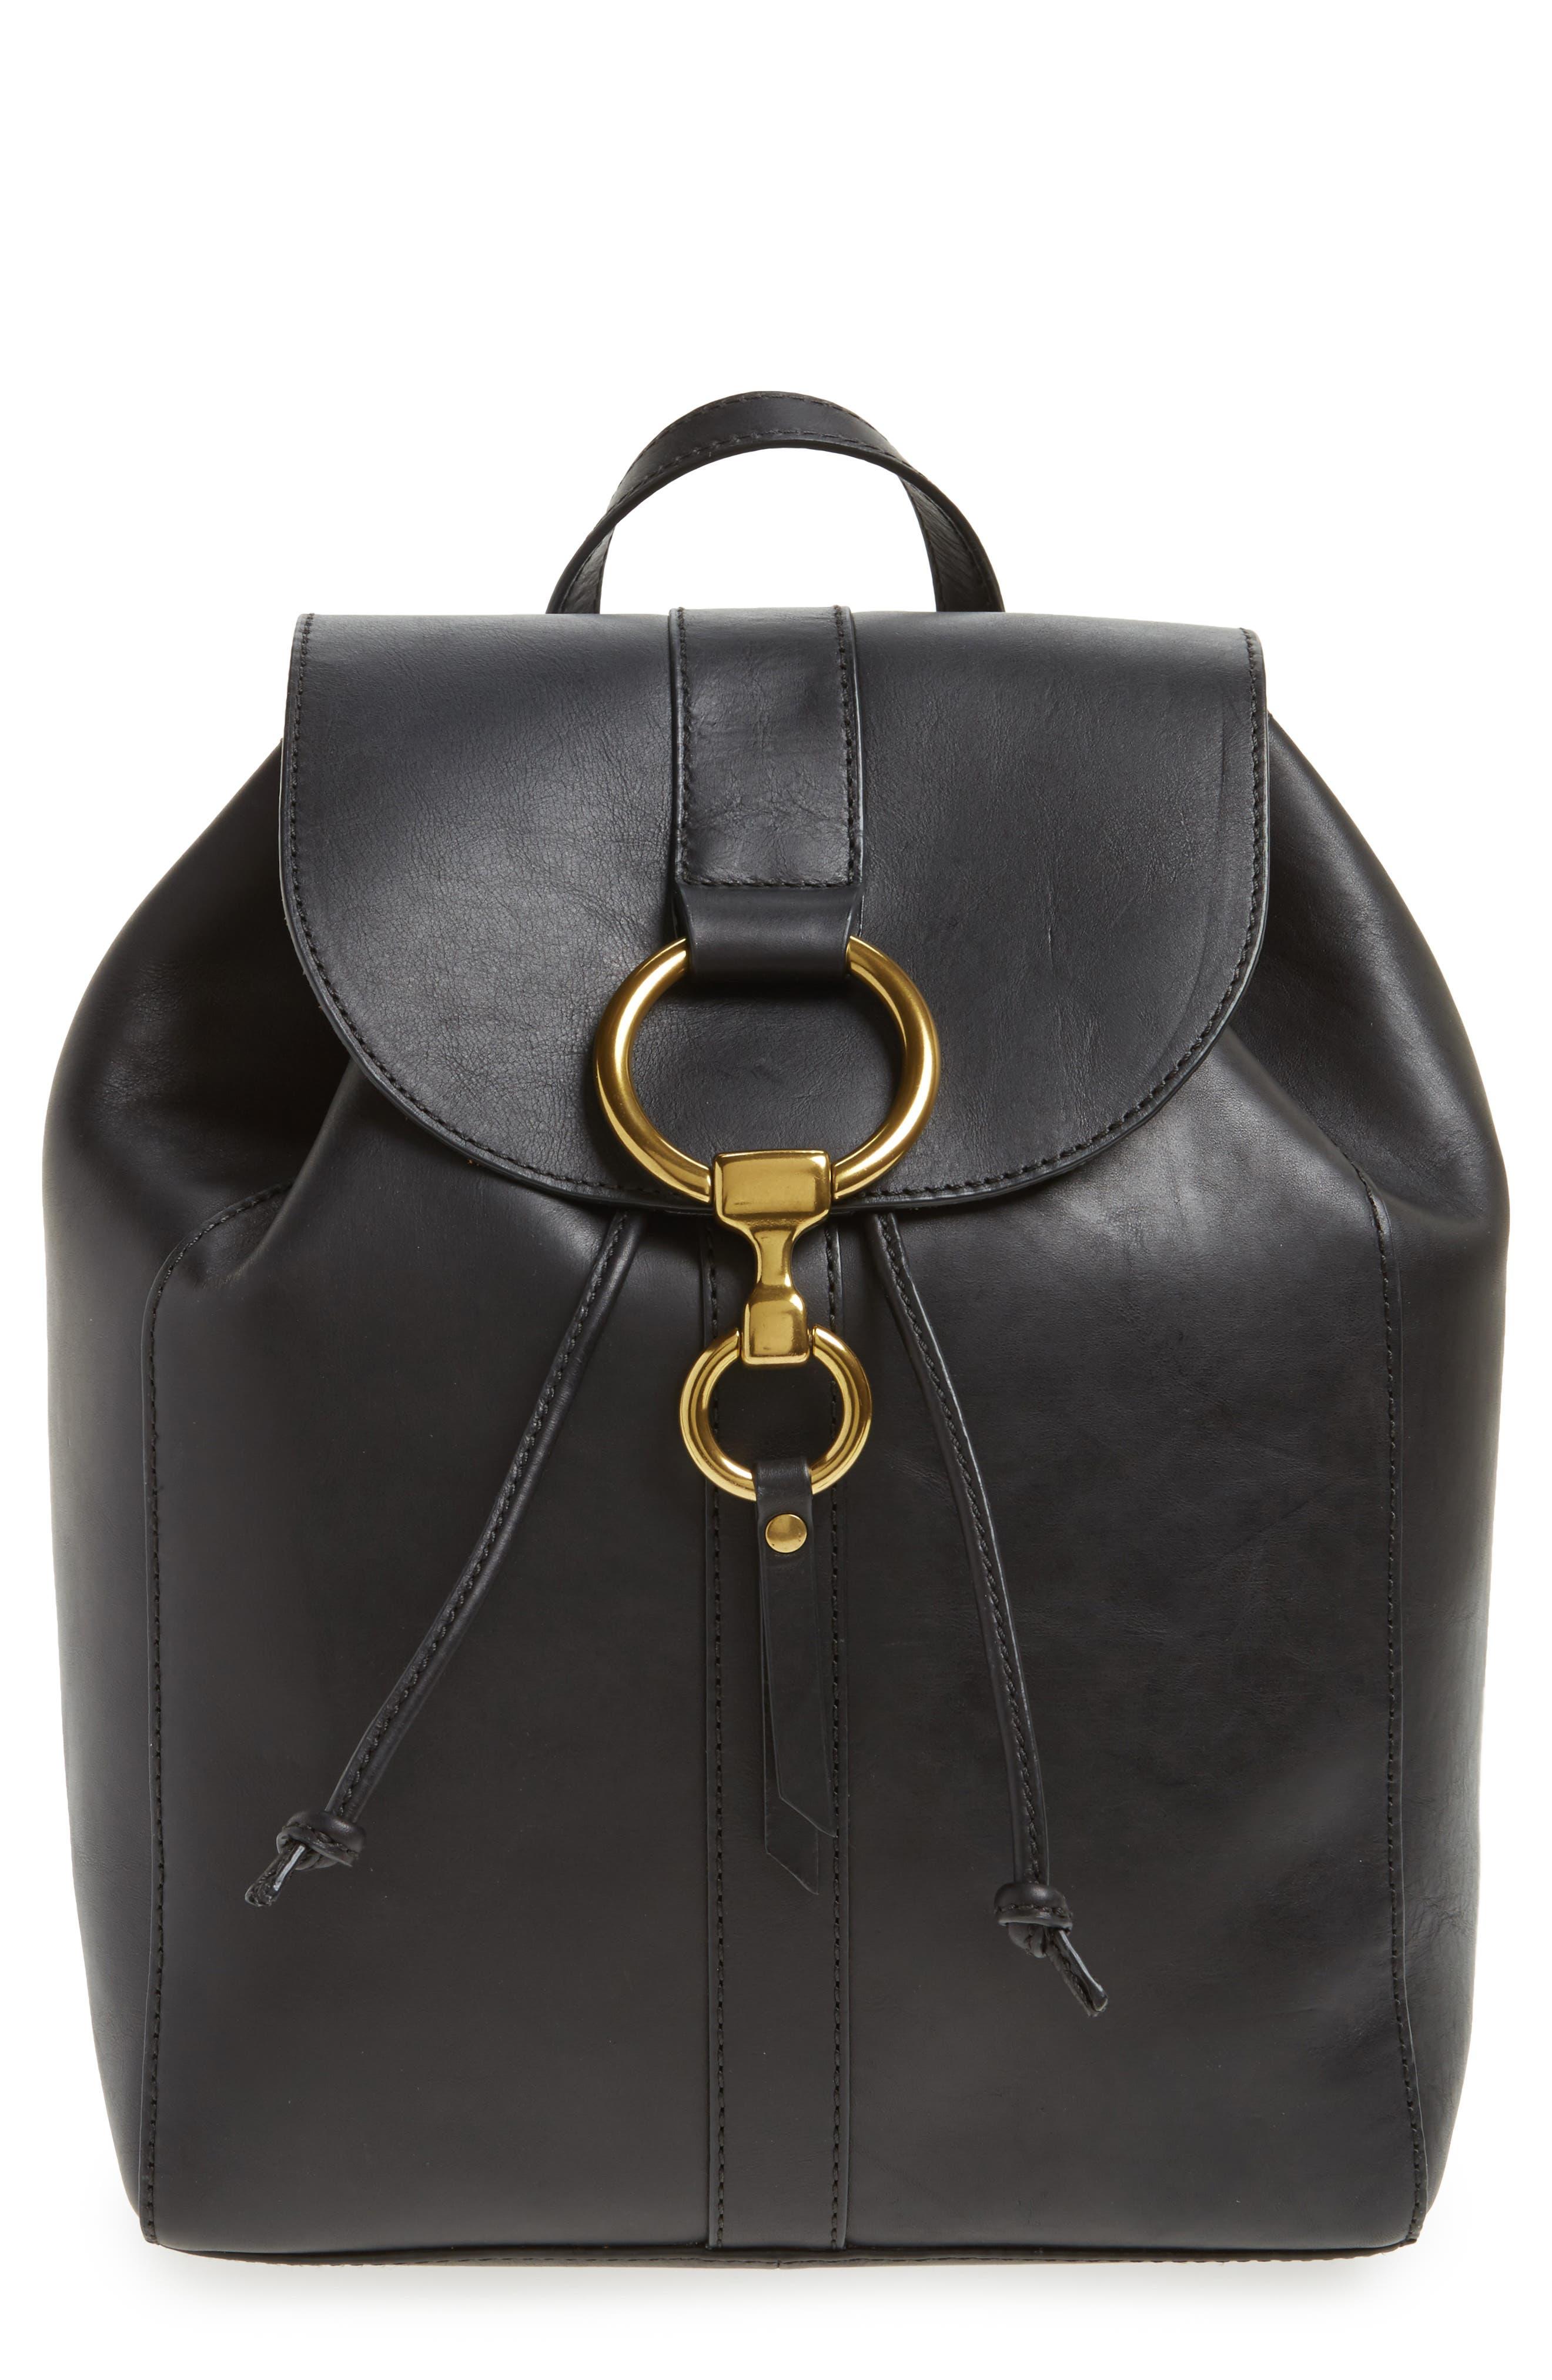 Ilana Harness Leather Backpack,                             Main thumbnail 1, color,                             Black